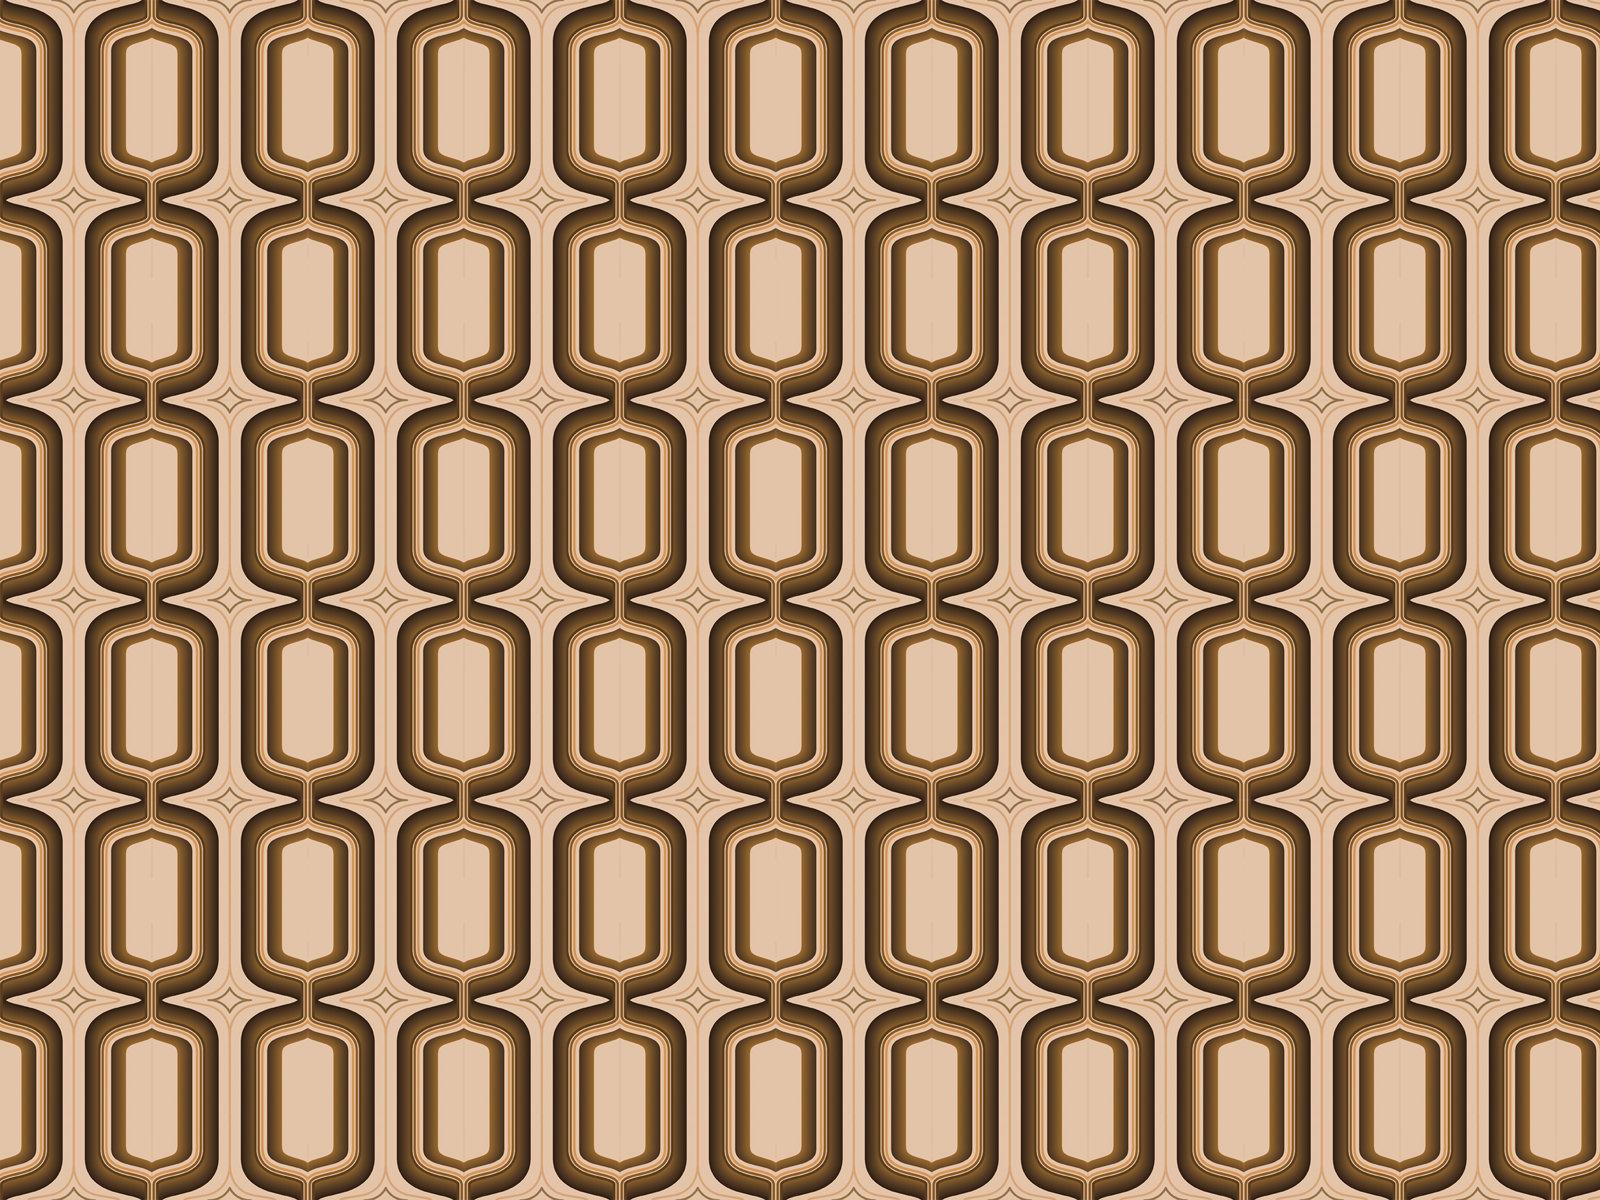 1970s Wallpaper 1